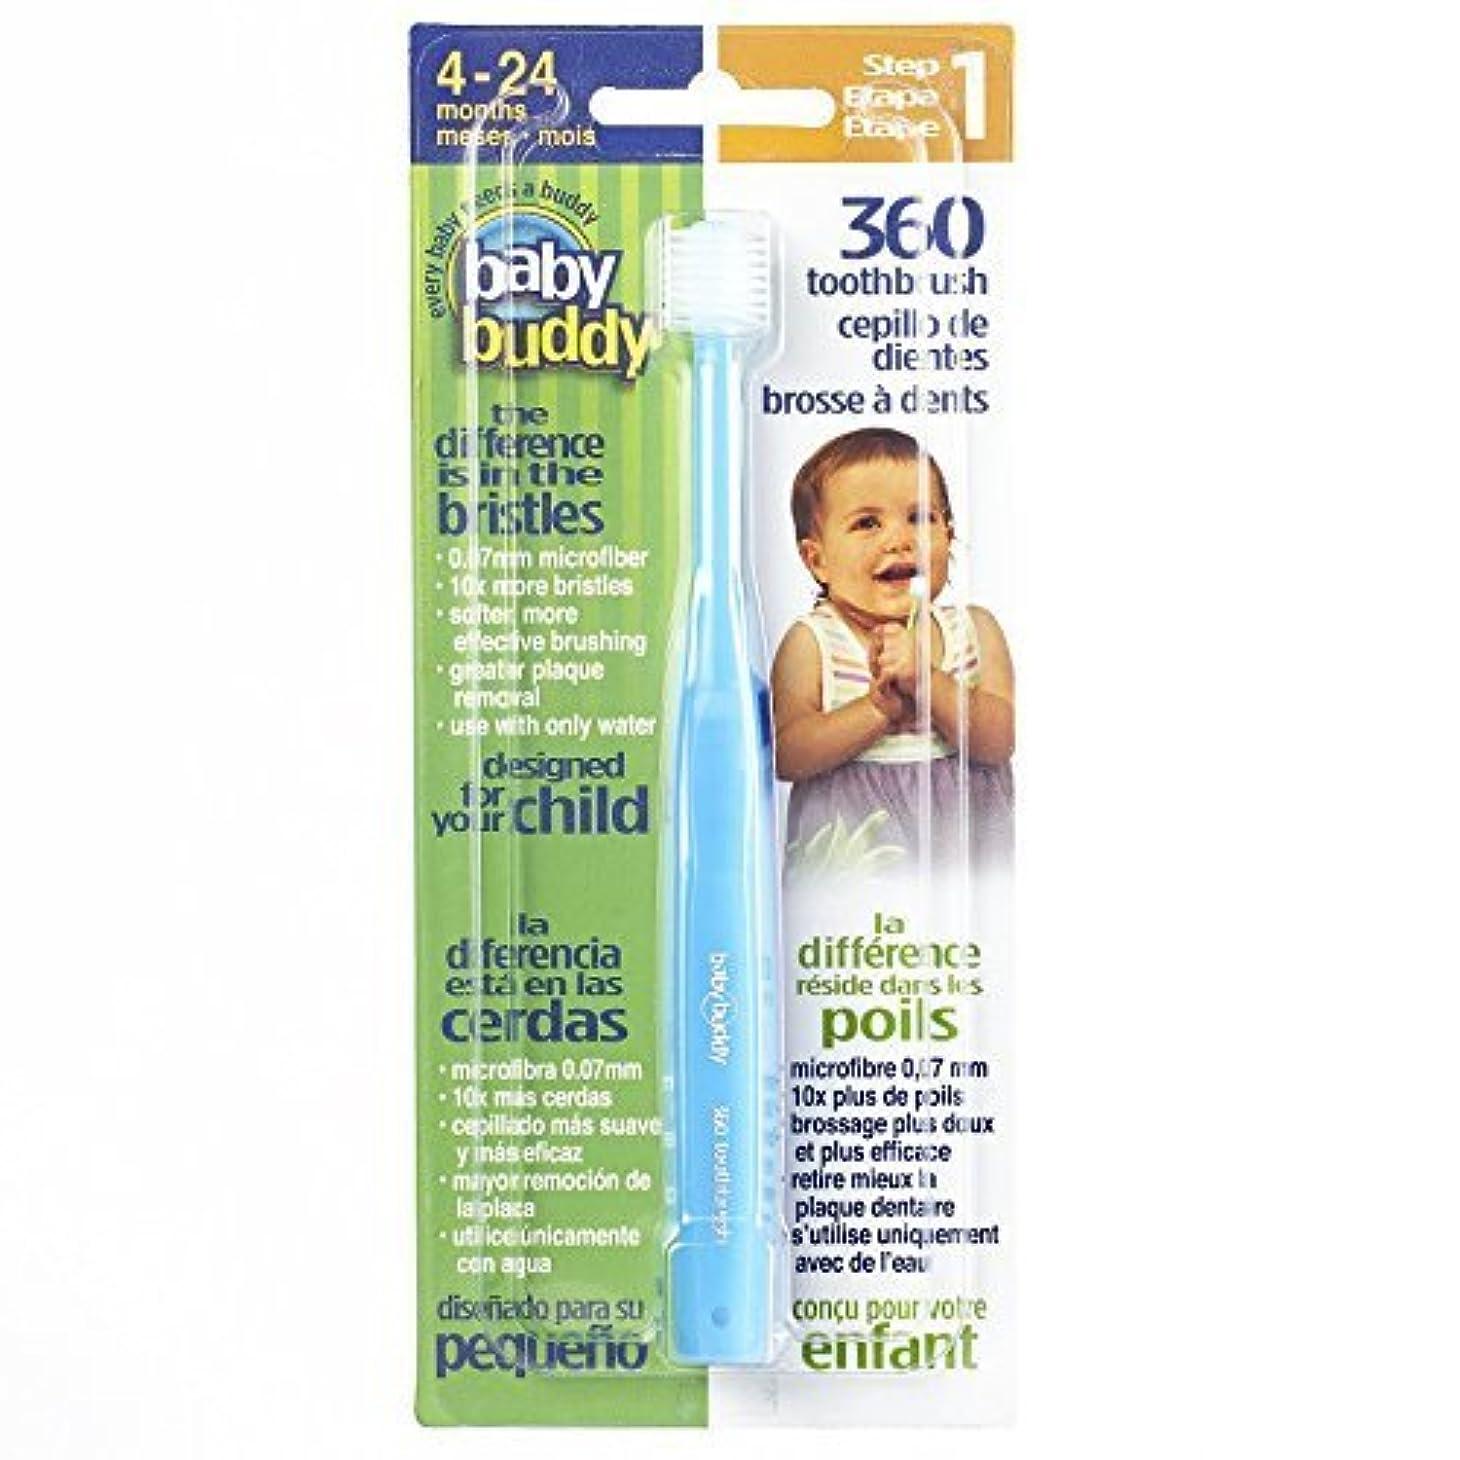 Baby Buddy 360 Toothbrush Step 1, Blue by Baby Buddy [並行輸入品]